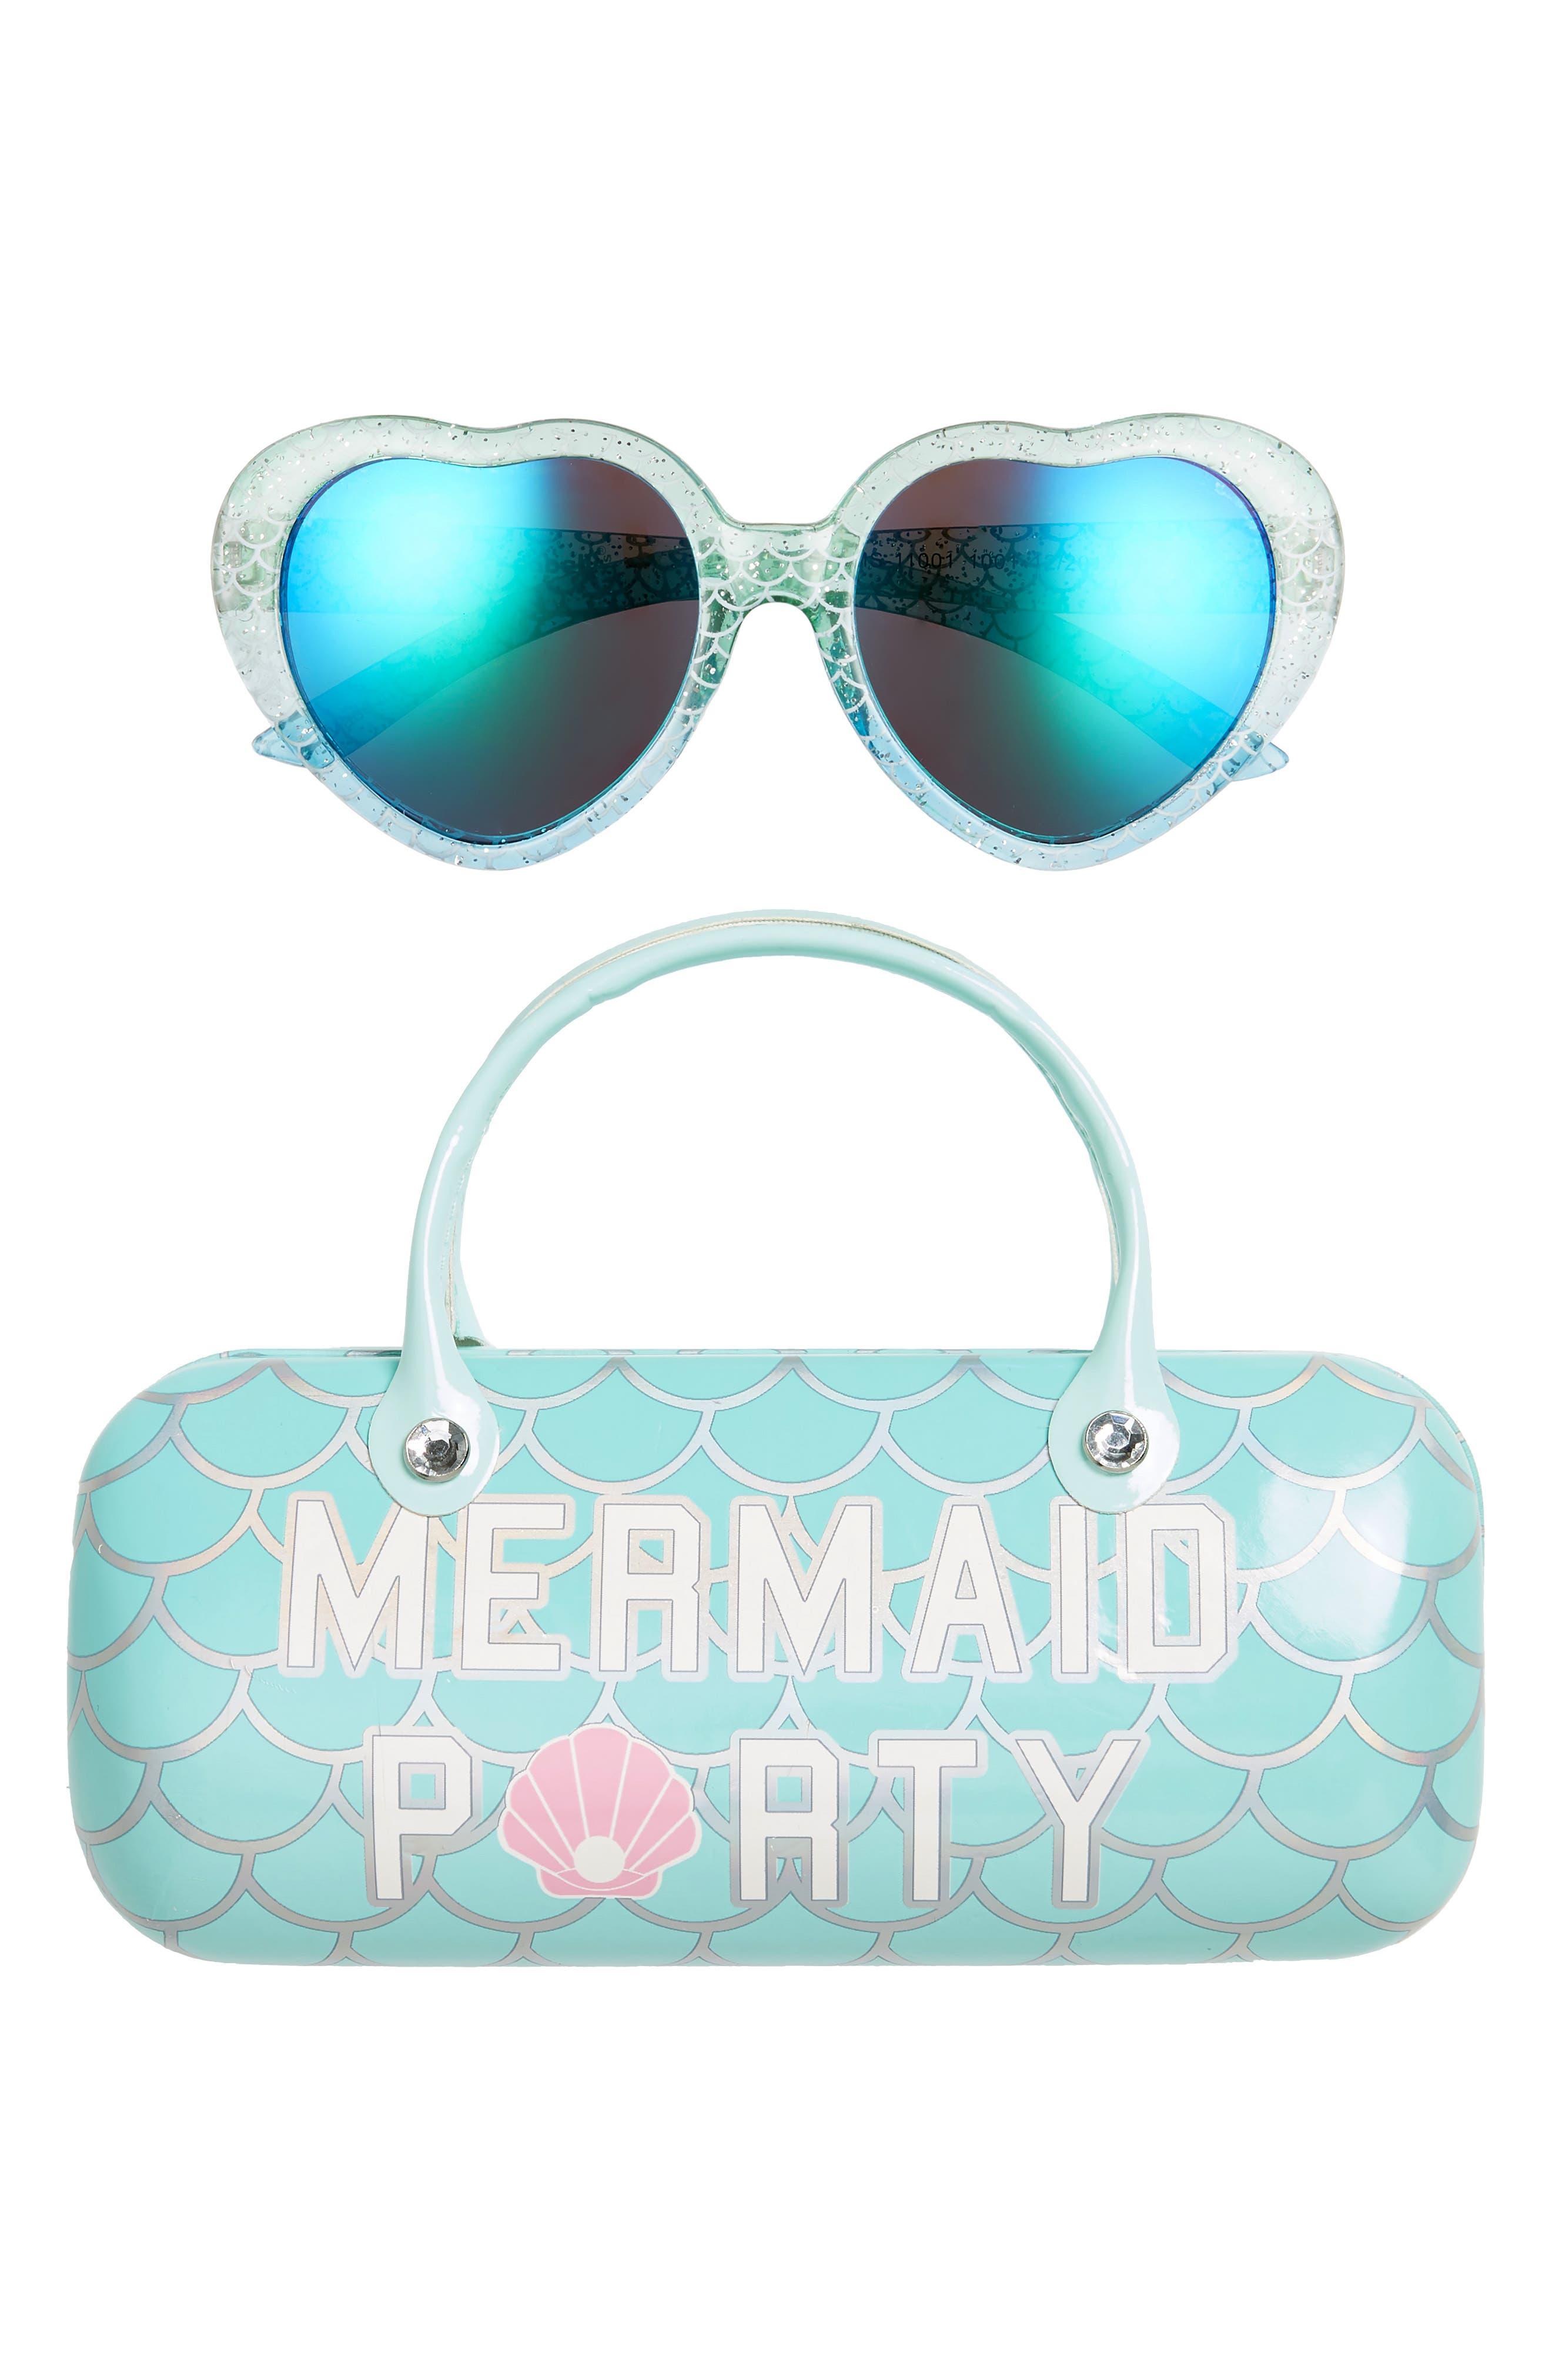 Girls Capelli New York Mermaid Party Mirrored Heart Sunglasses  Hard Case Set  Multi Combo